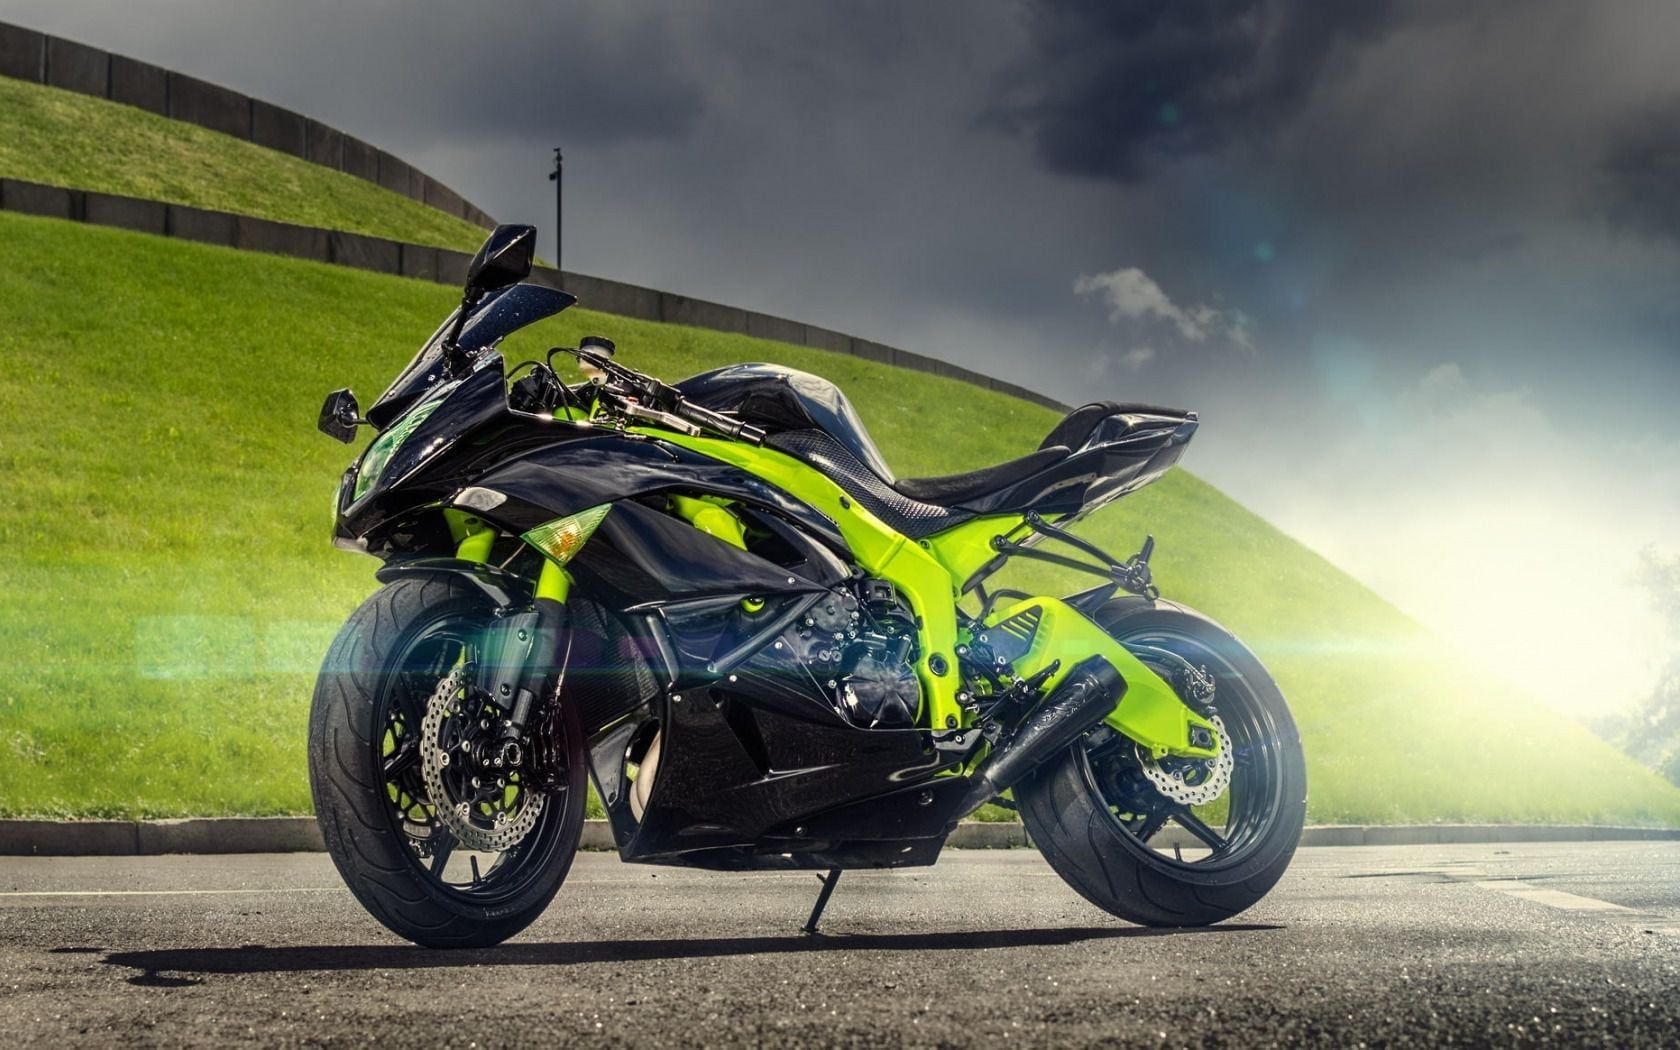 36 Kawasaki Ninja Wallpapers Hd High Quality Android Kawasaki